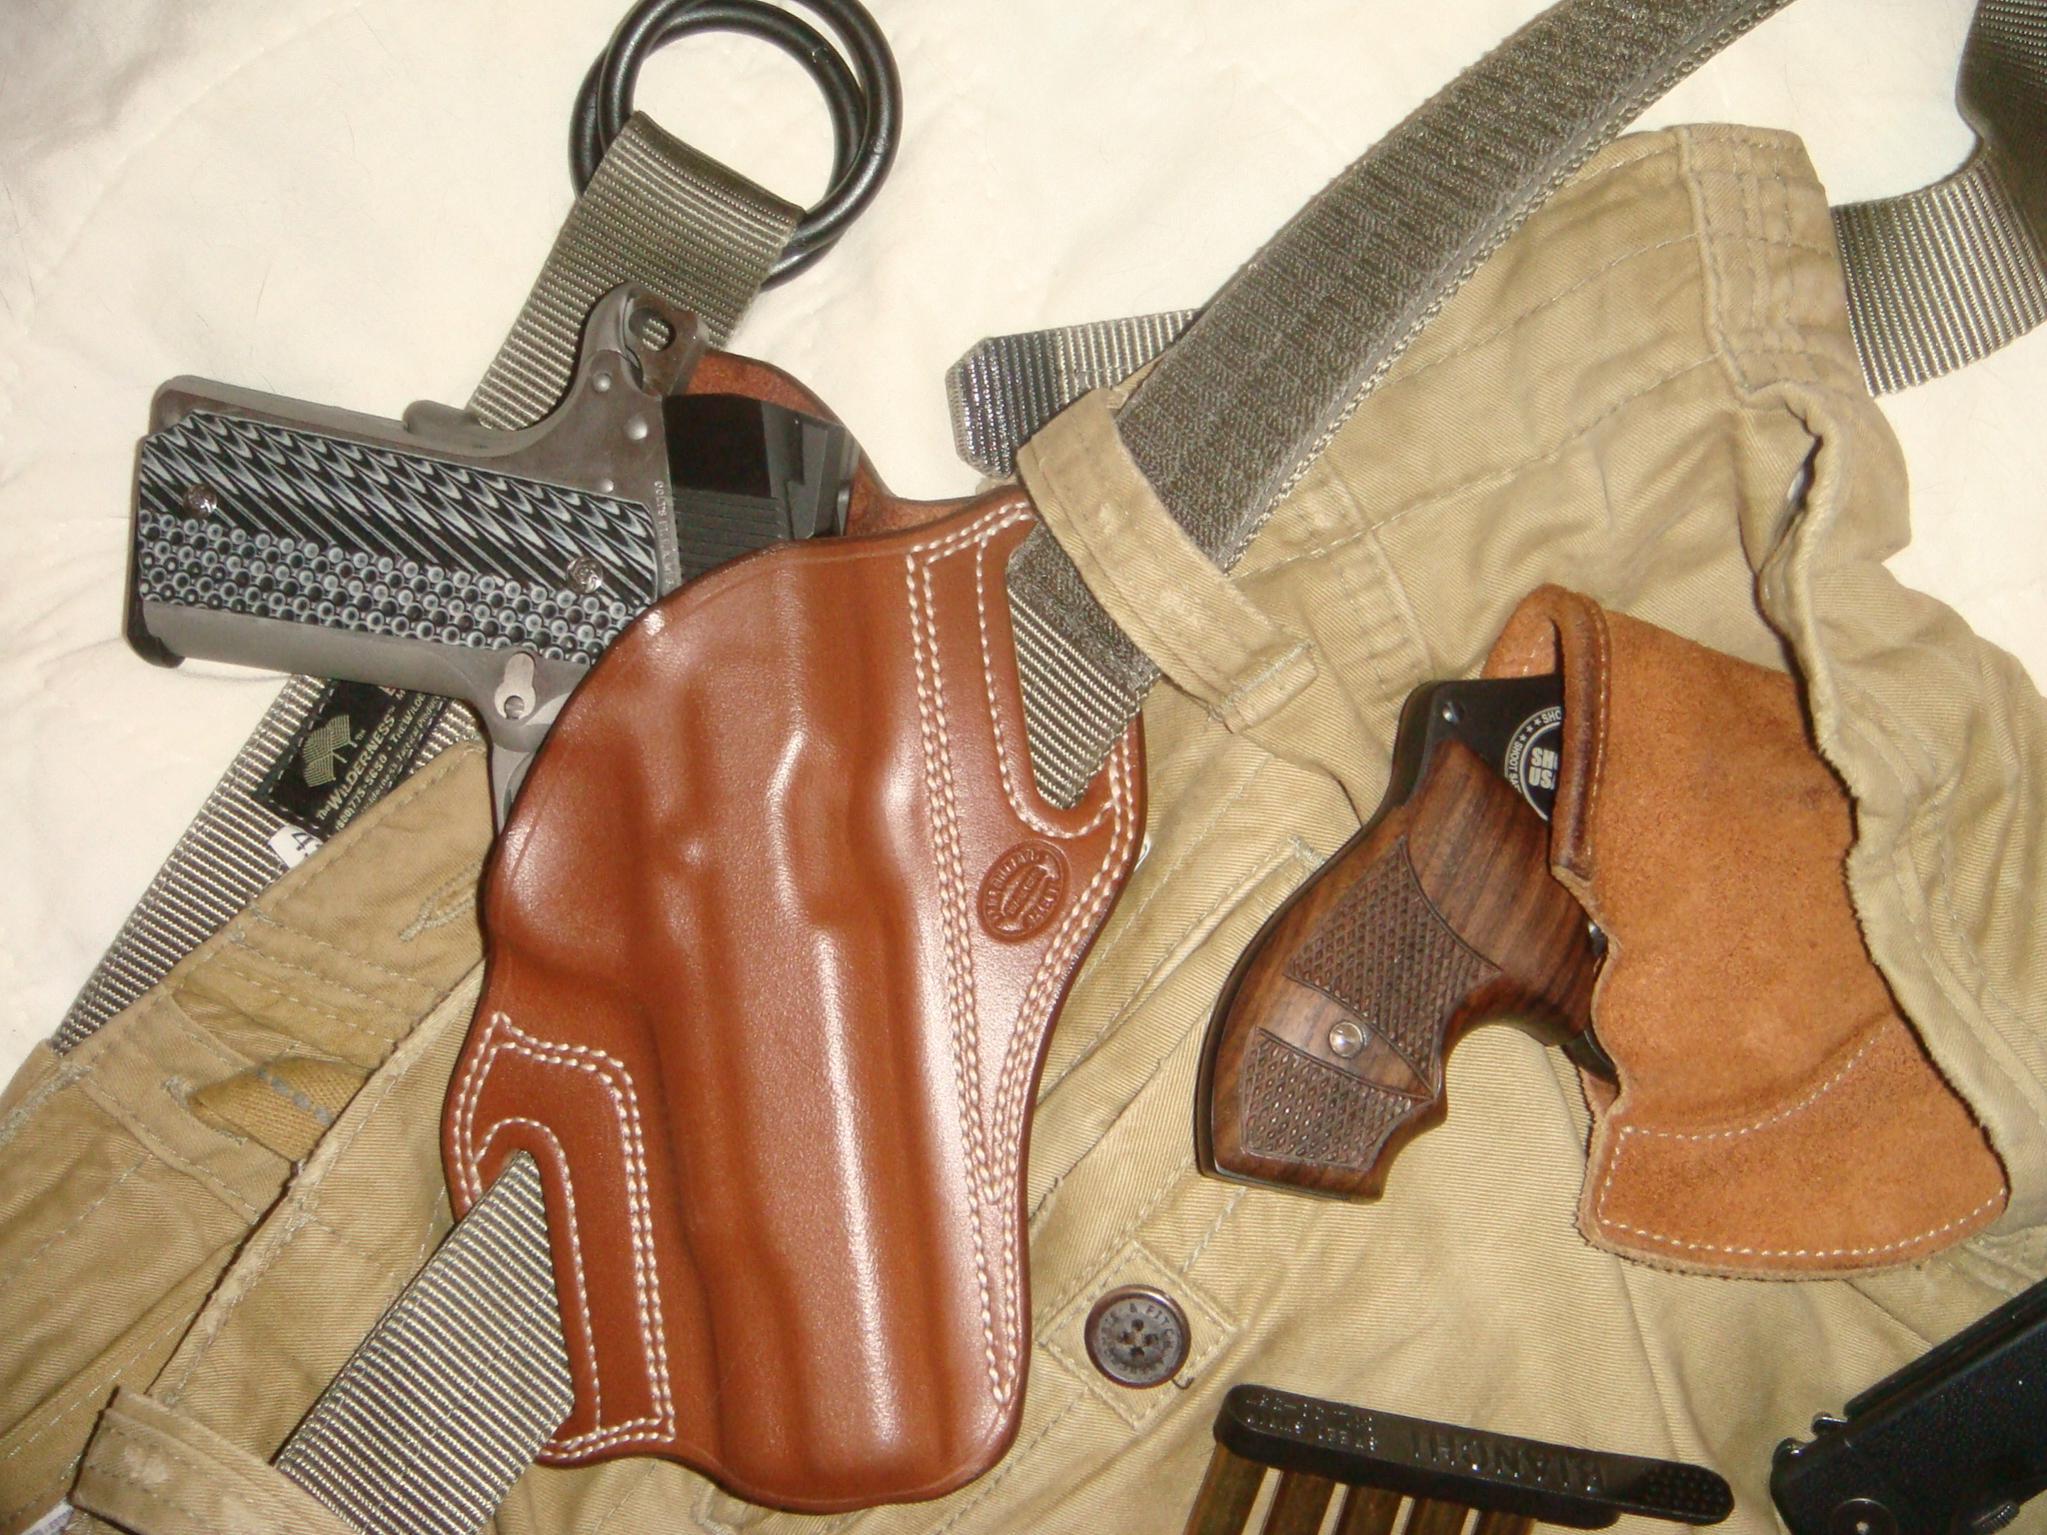 D.M. Bullard Bodyguard - Superb OWB Concealment-dsc00776.jpg